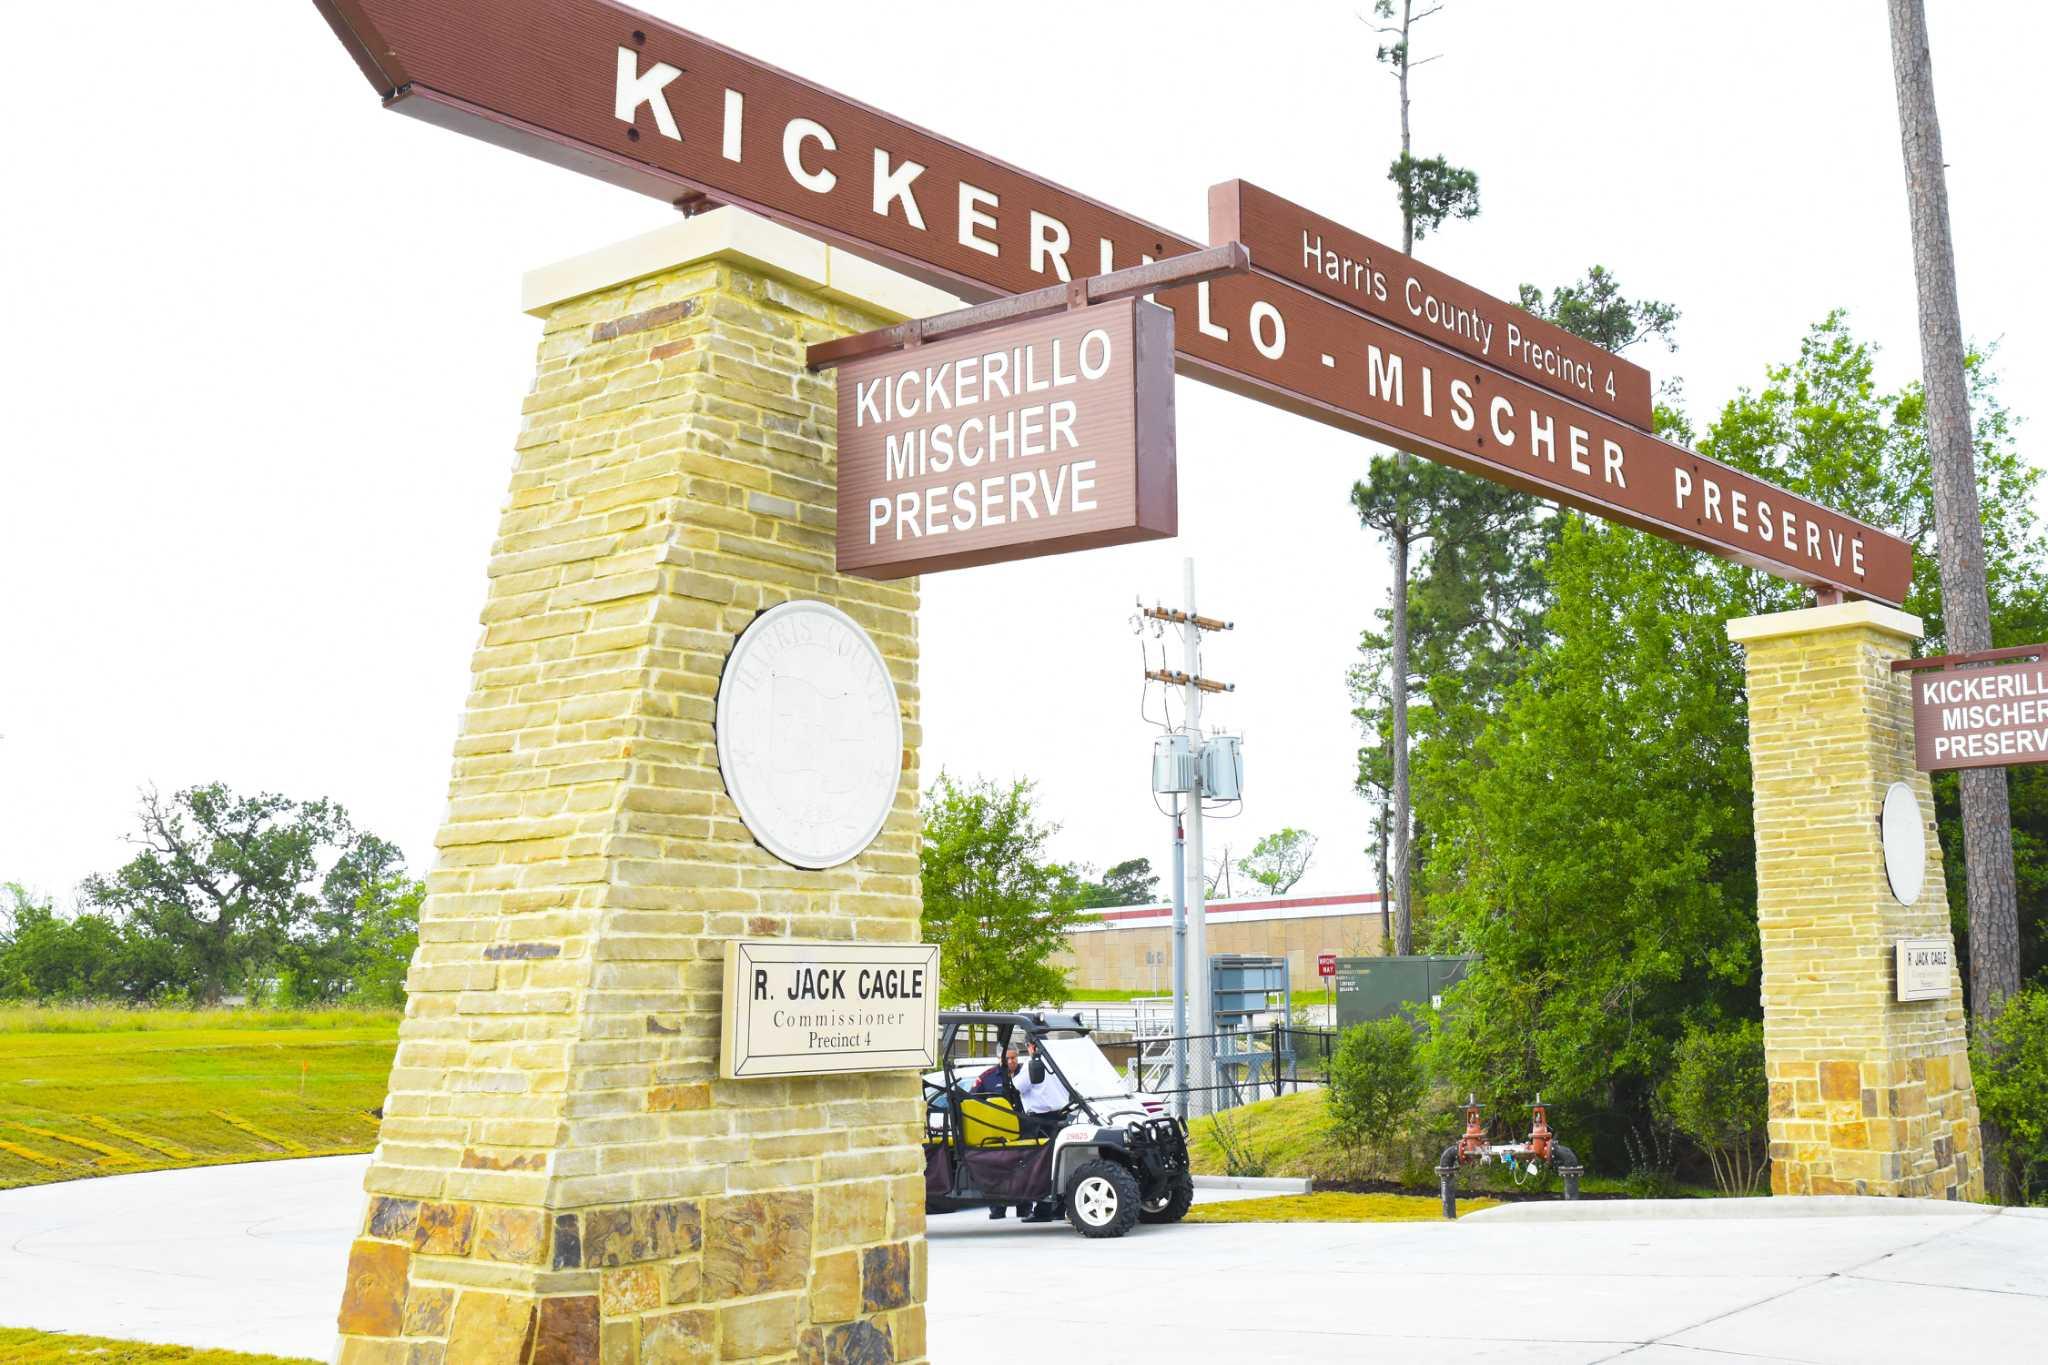 Photos Kickerillo Mischer Preserve Opens Laredo Morning